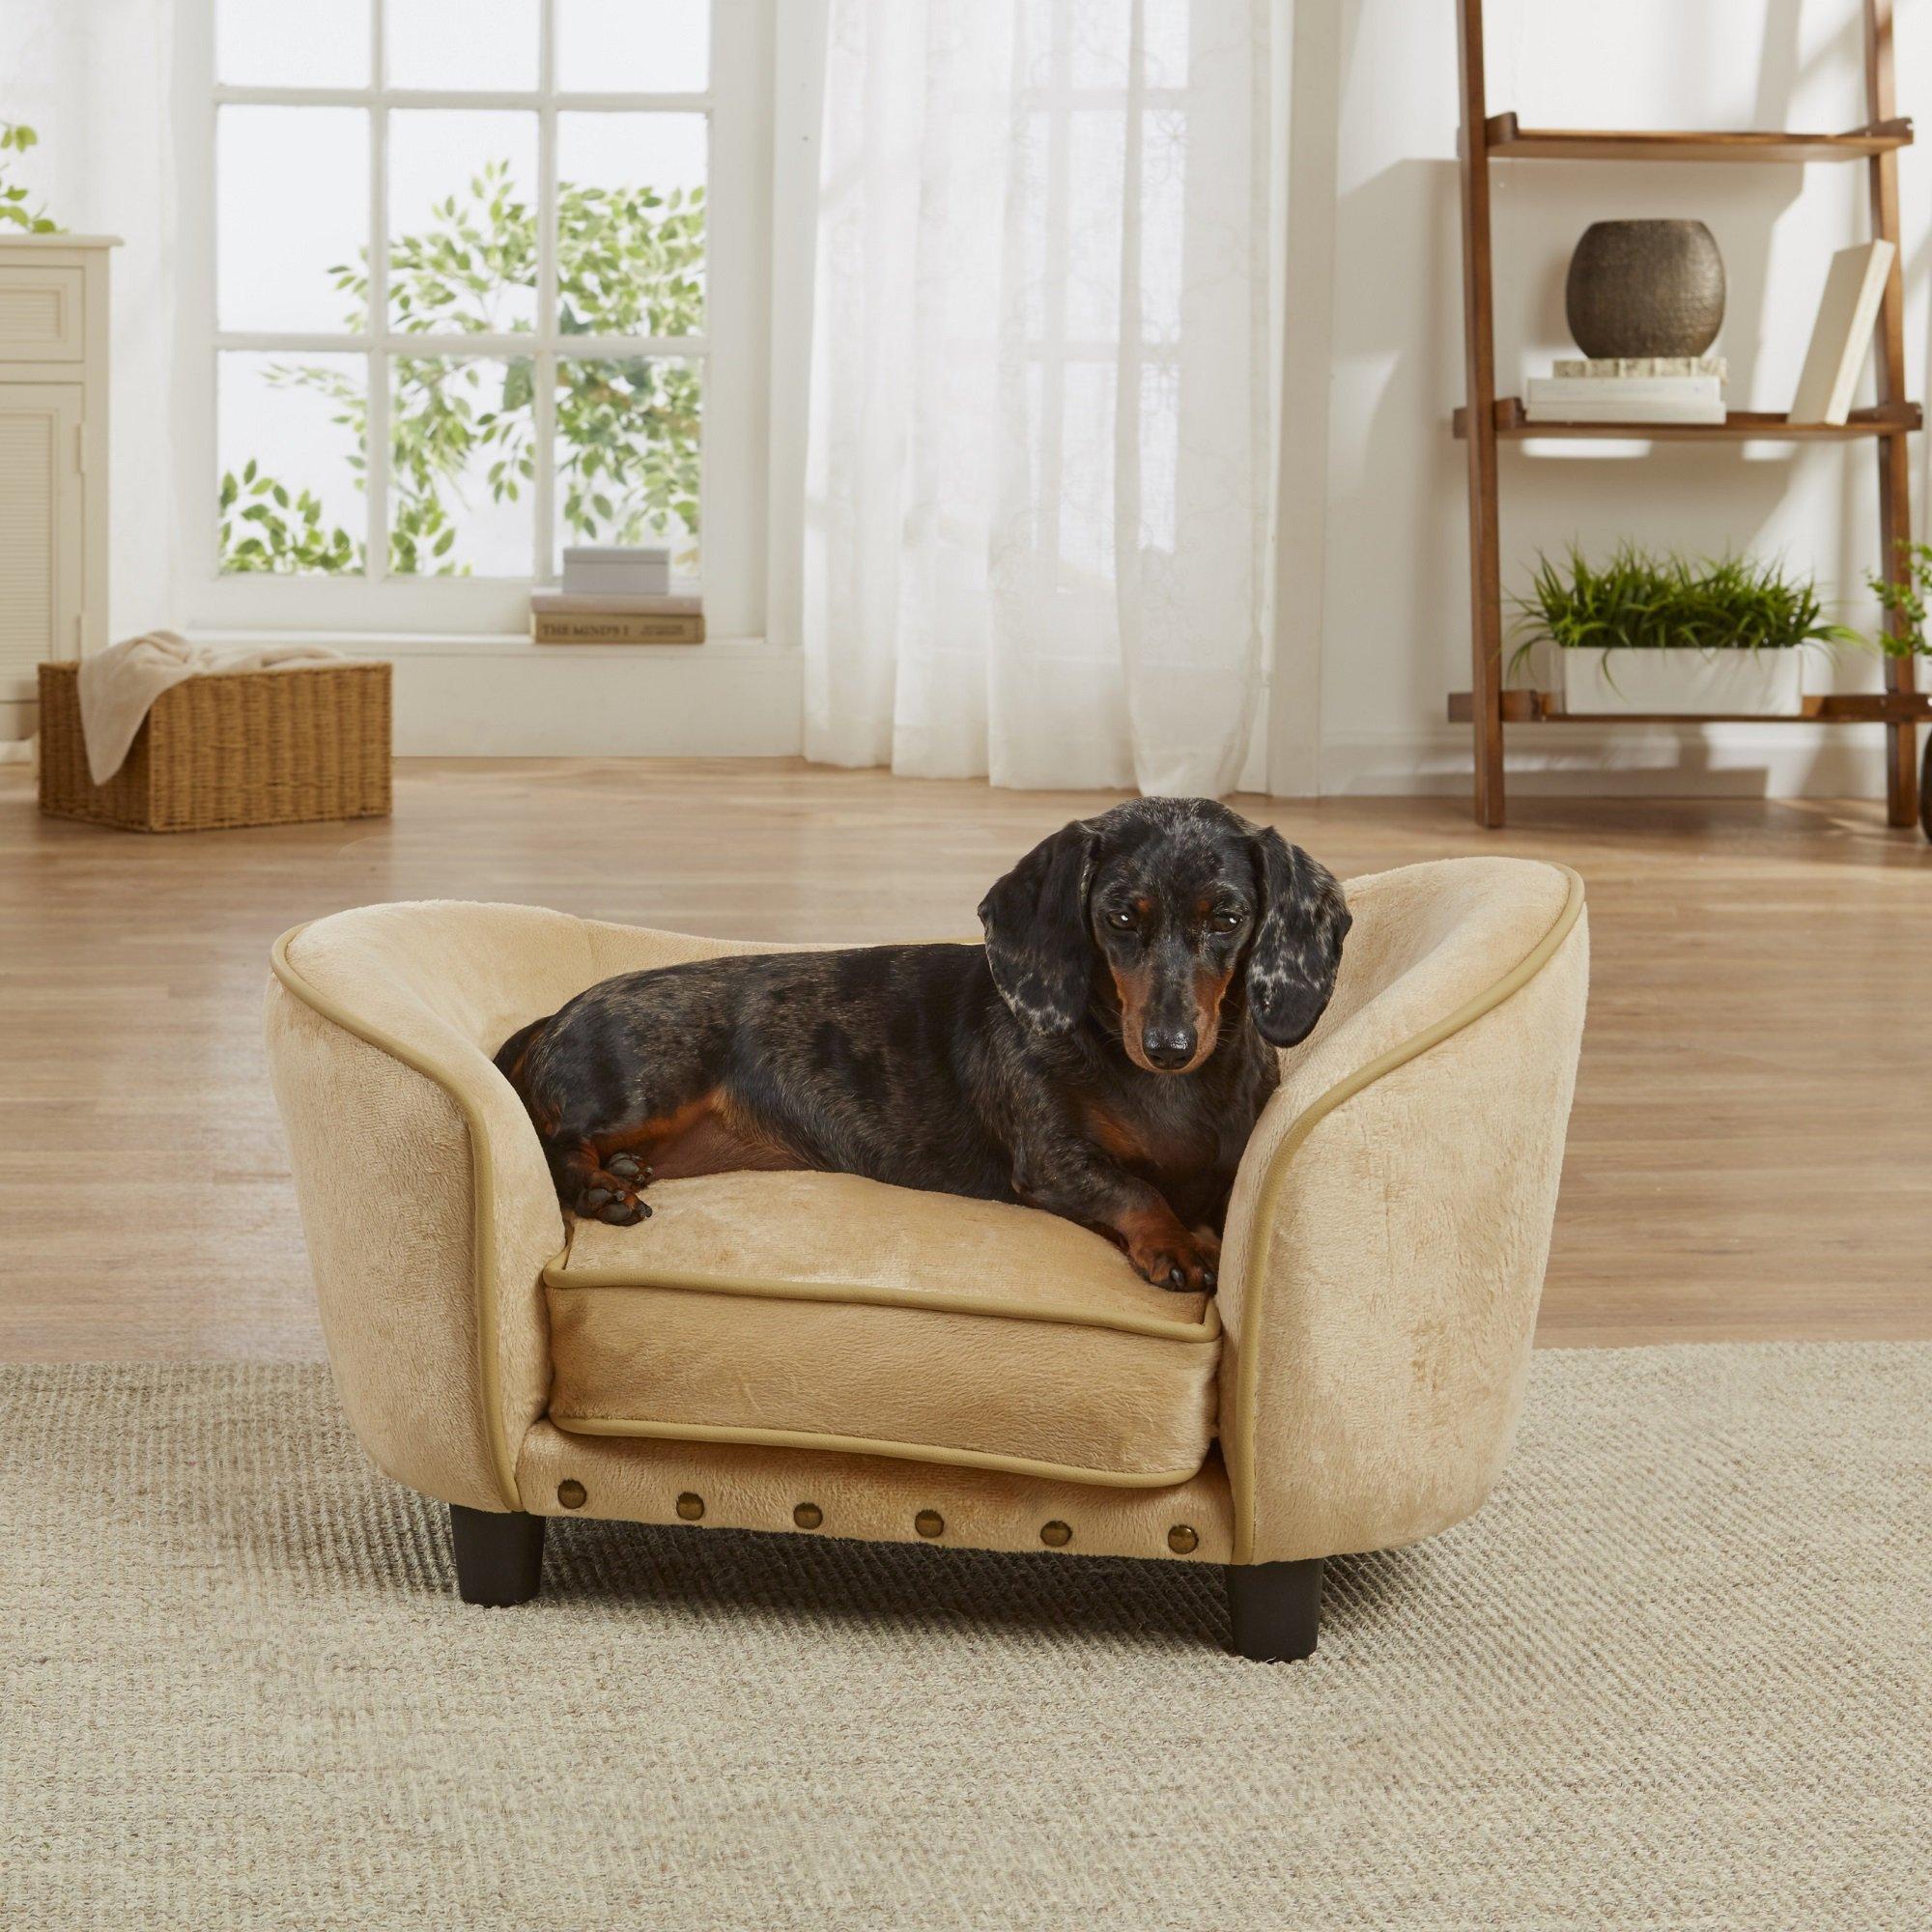 enchanted home mackenzie pet sofa 2 seater covers uk caramel ultra plush snuggle